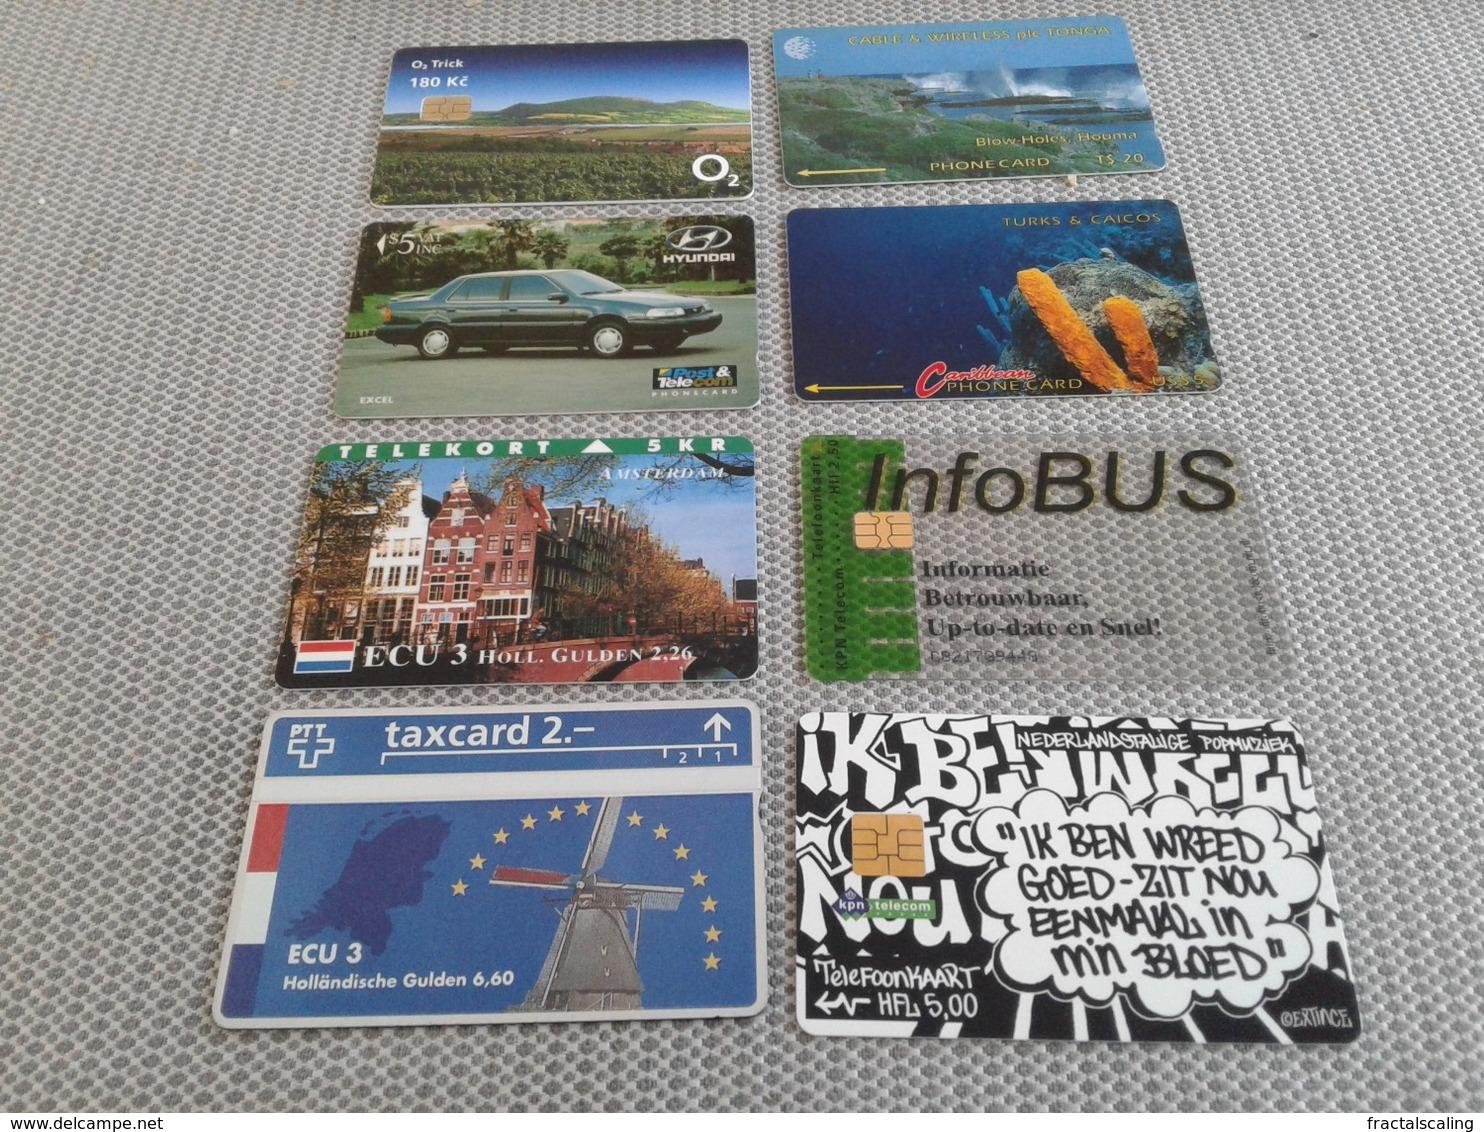 8 Rarer Phonecards At Good Price - Origen Desconocido